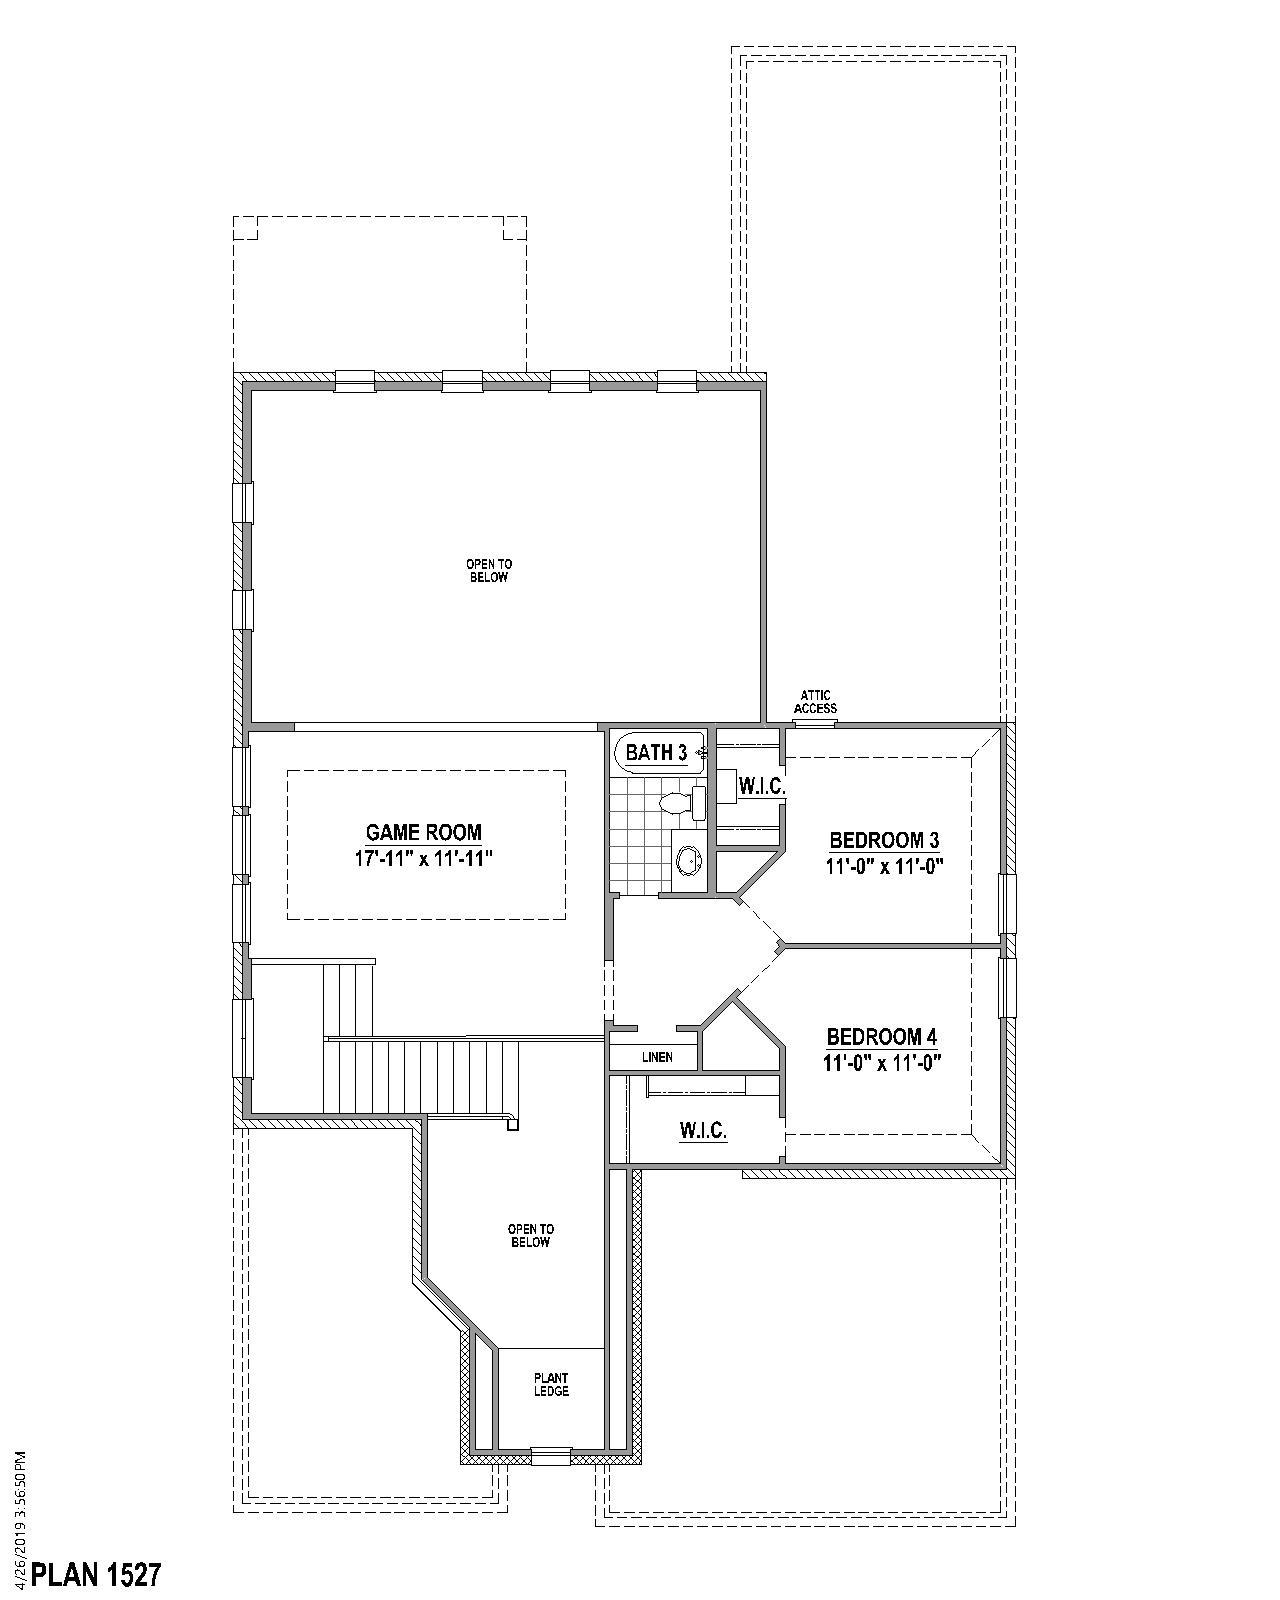 Plan 1527 Floor Plan